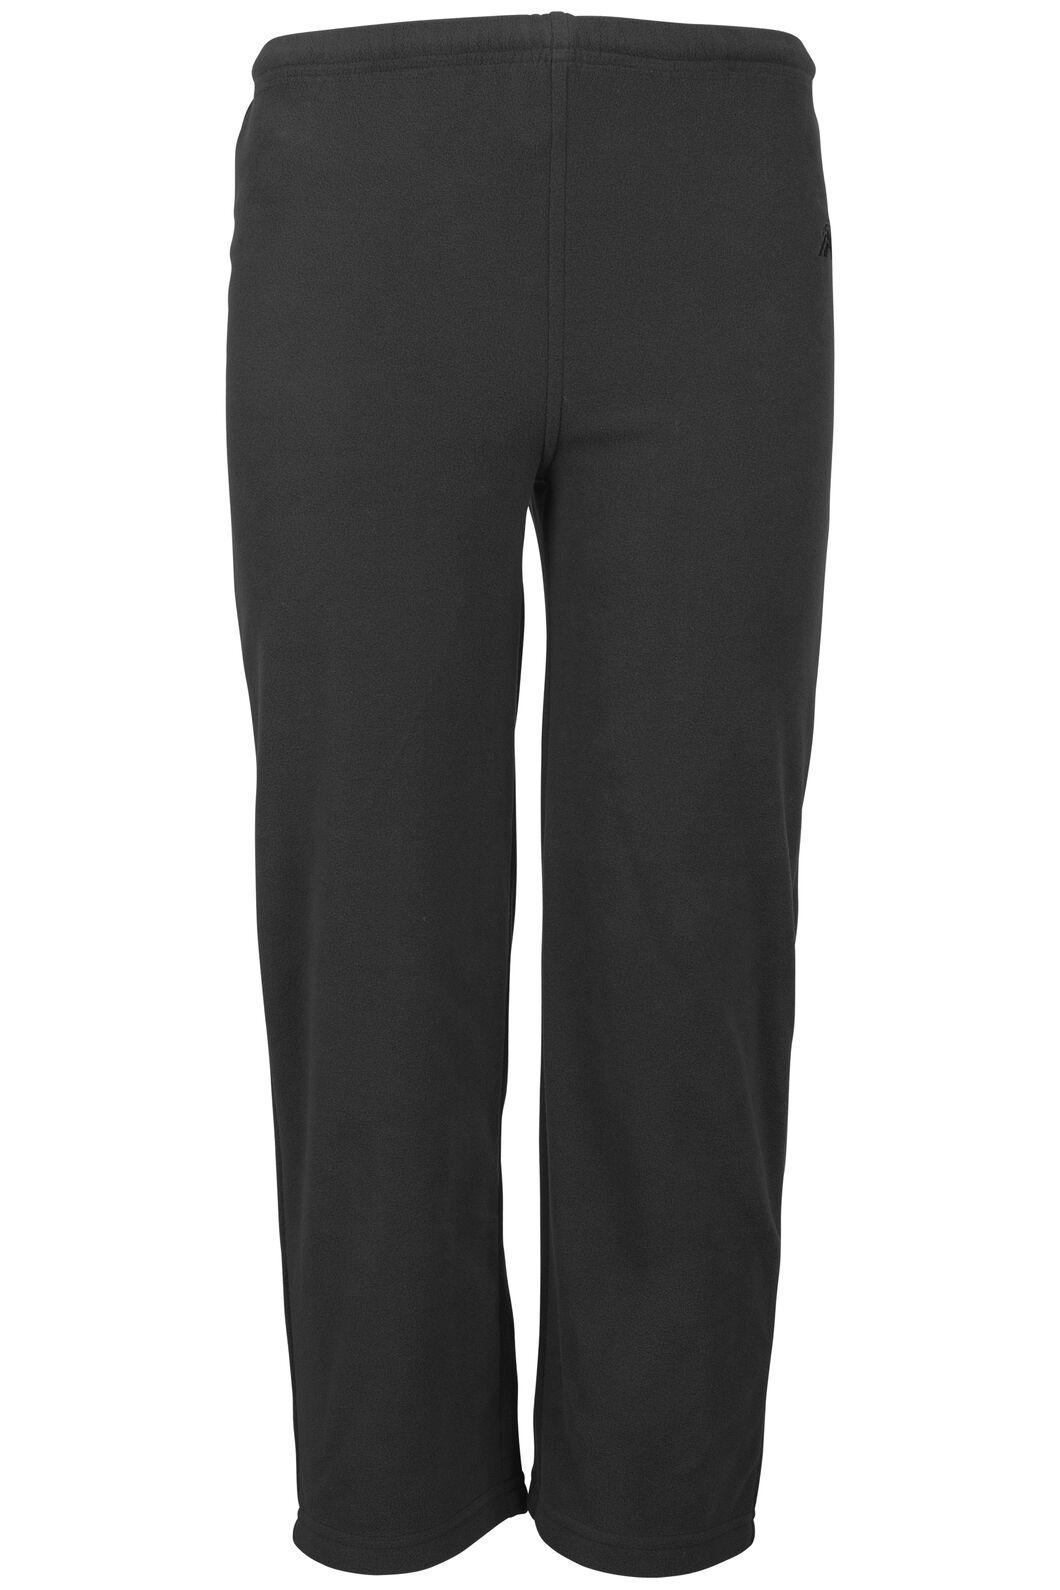 Macpac Pepe Fleece Pants - Kids', Black, hi-res